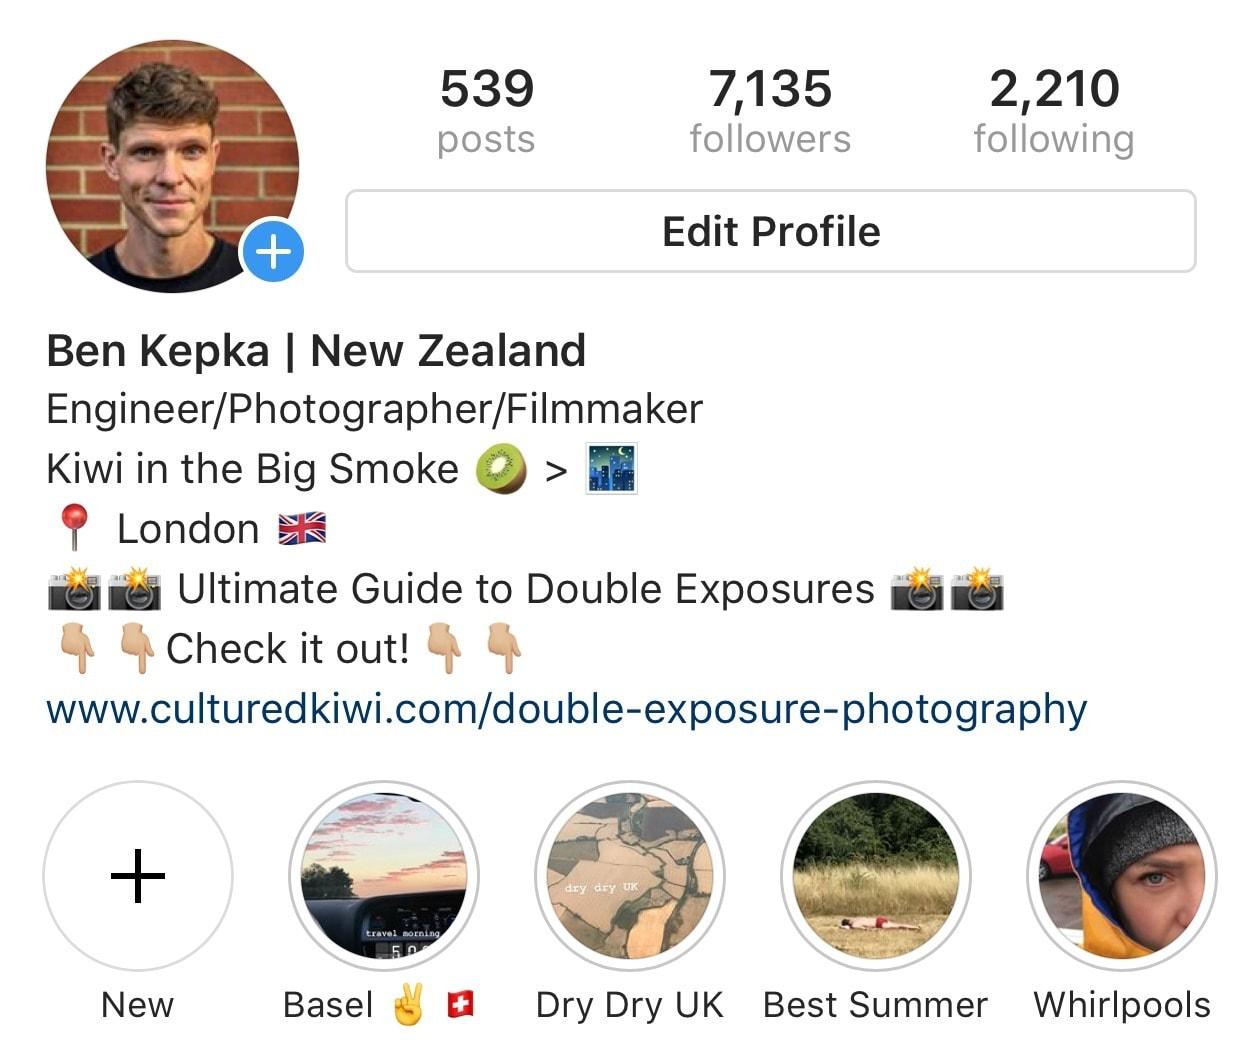 ben kepka instagram profile